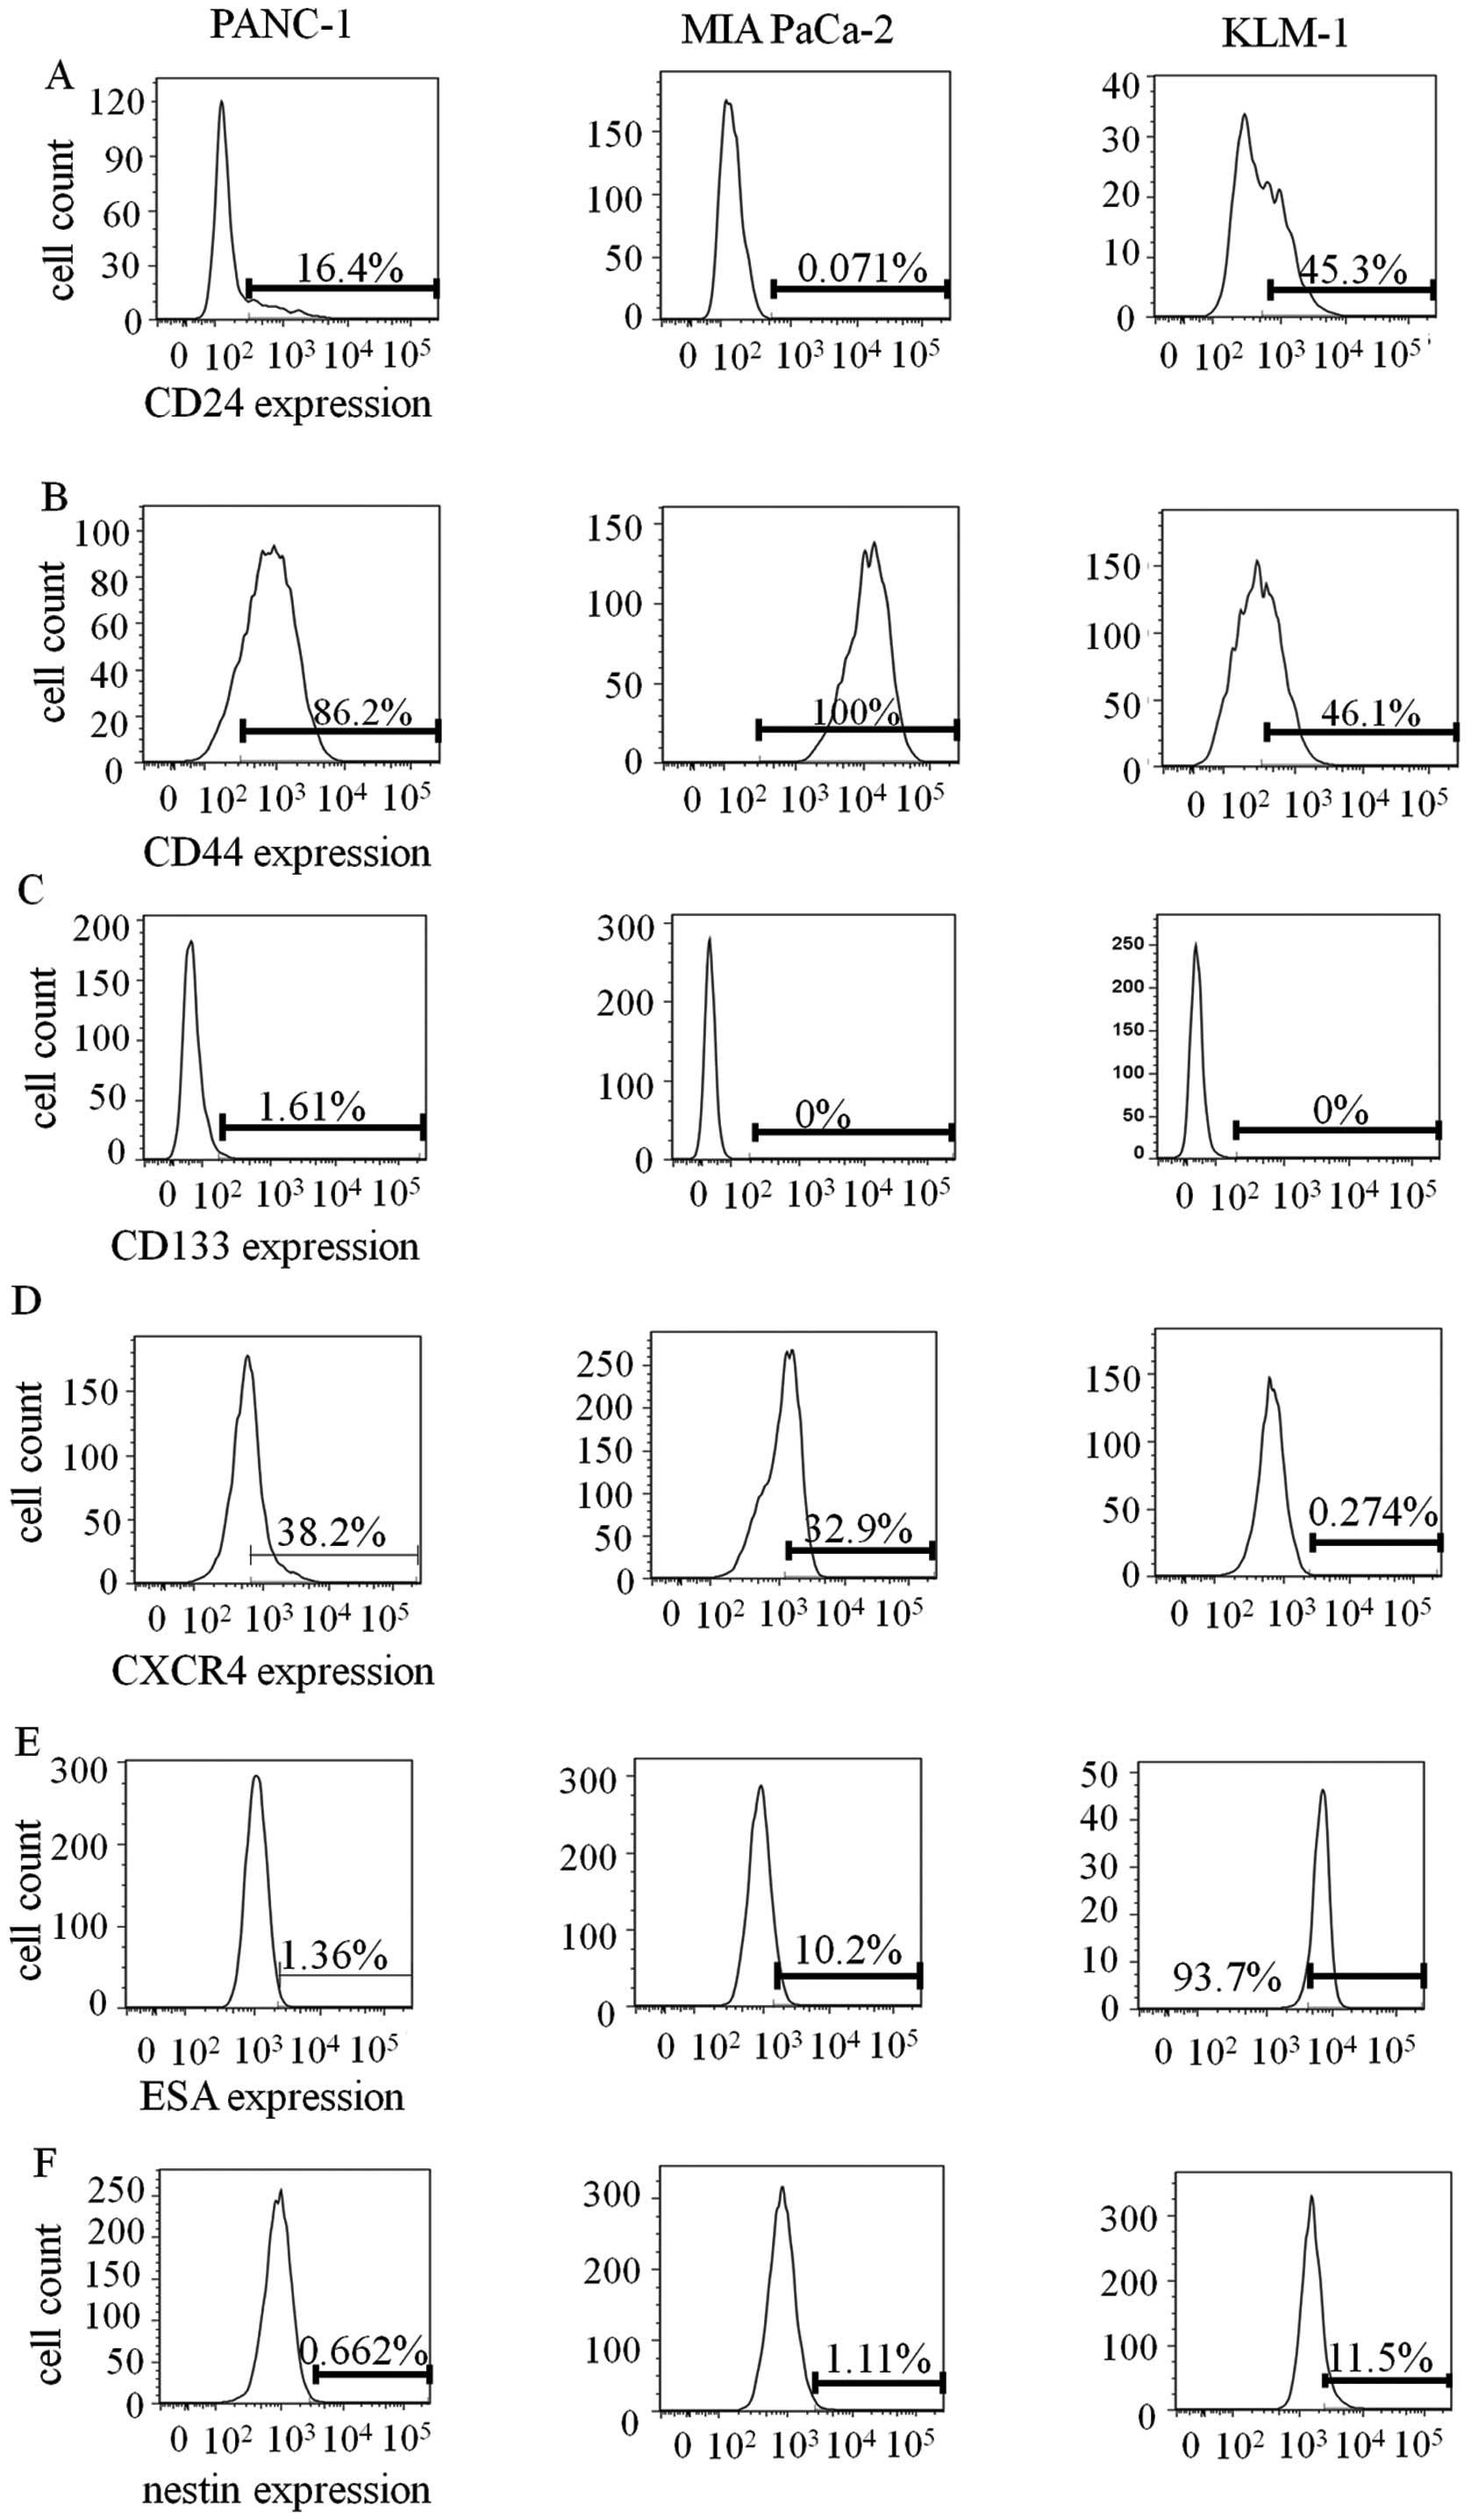 cancer pancreas marker hpv virus-prirodno lijecenje